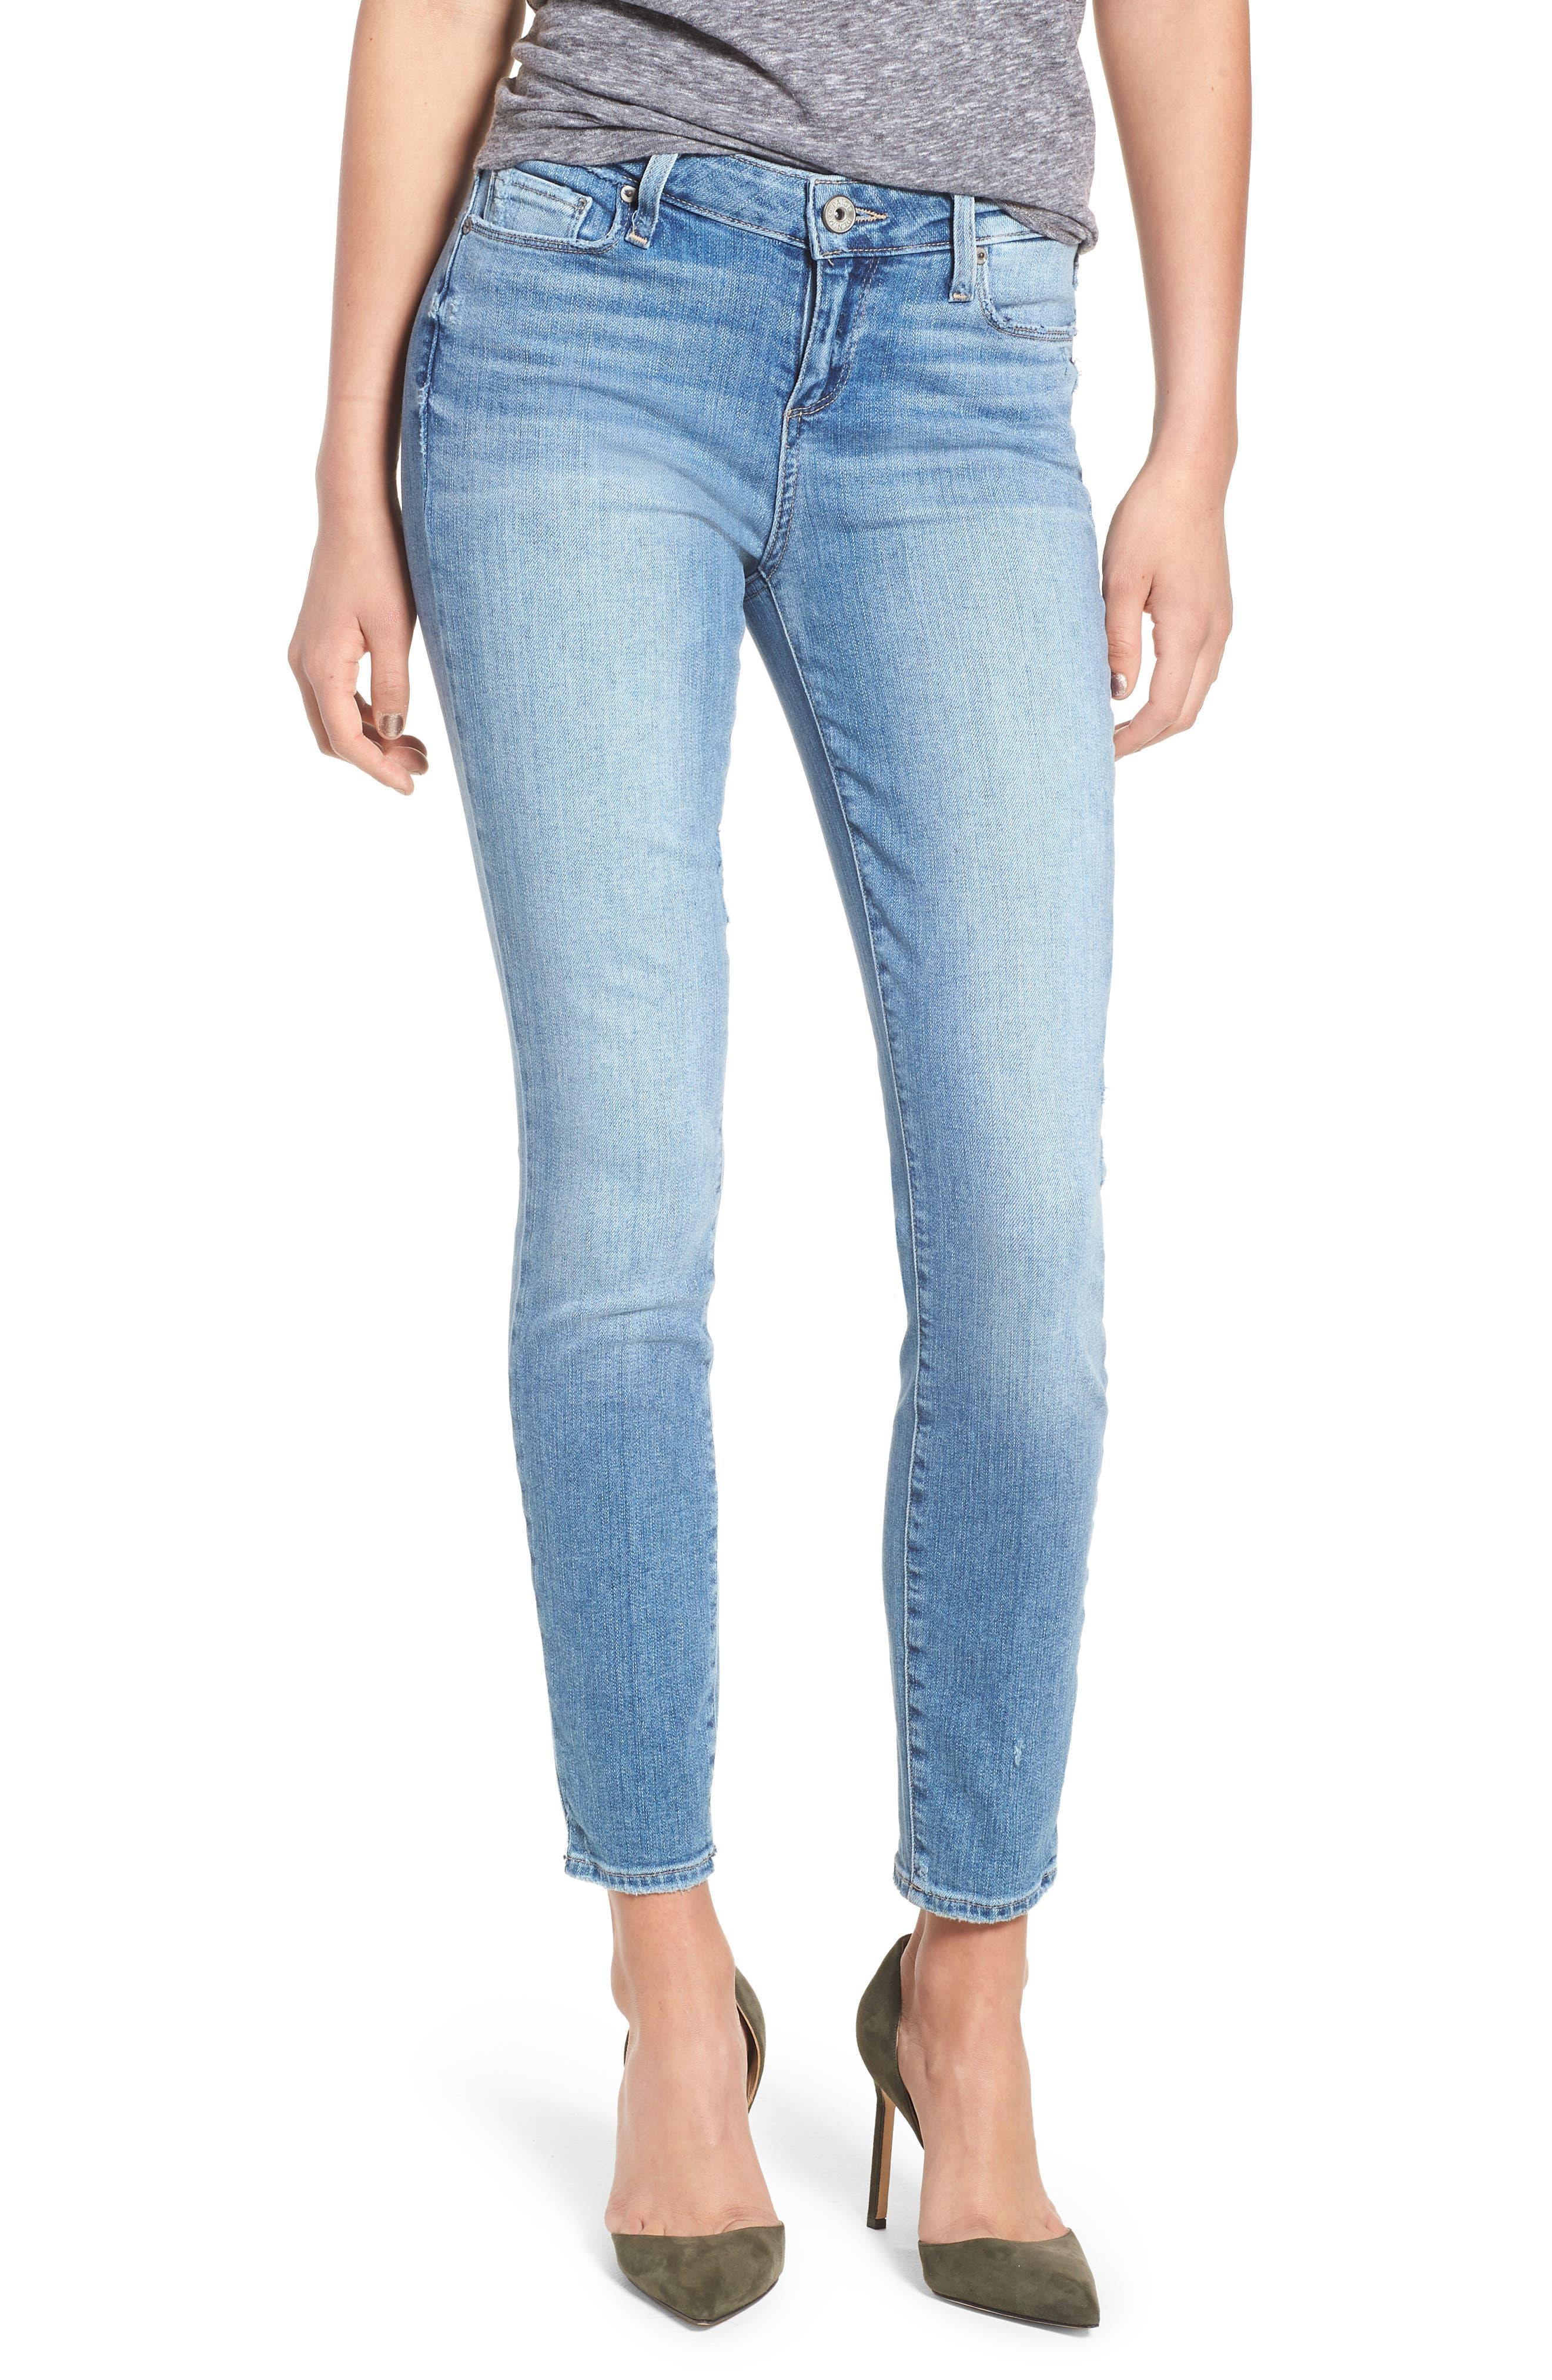 Transcend - Verdugo Ankle Ultra Skinny Jeans,                             Main thumbnail 1, color,                             400